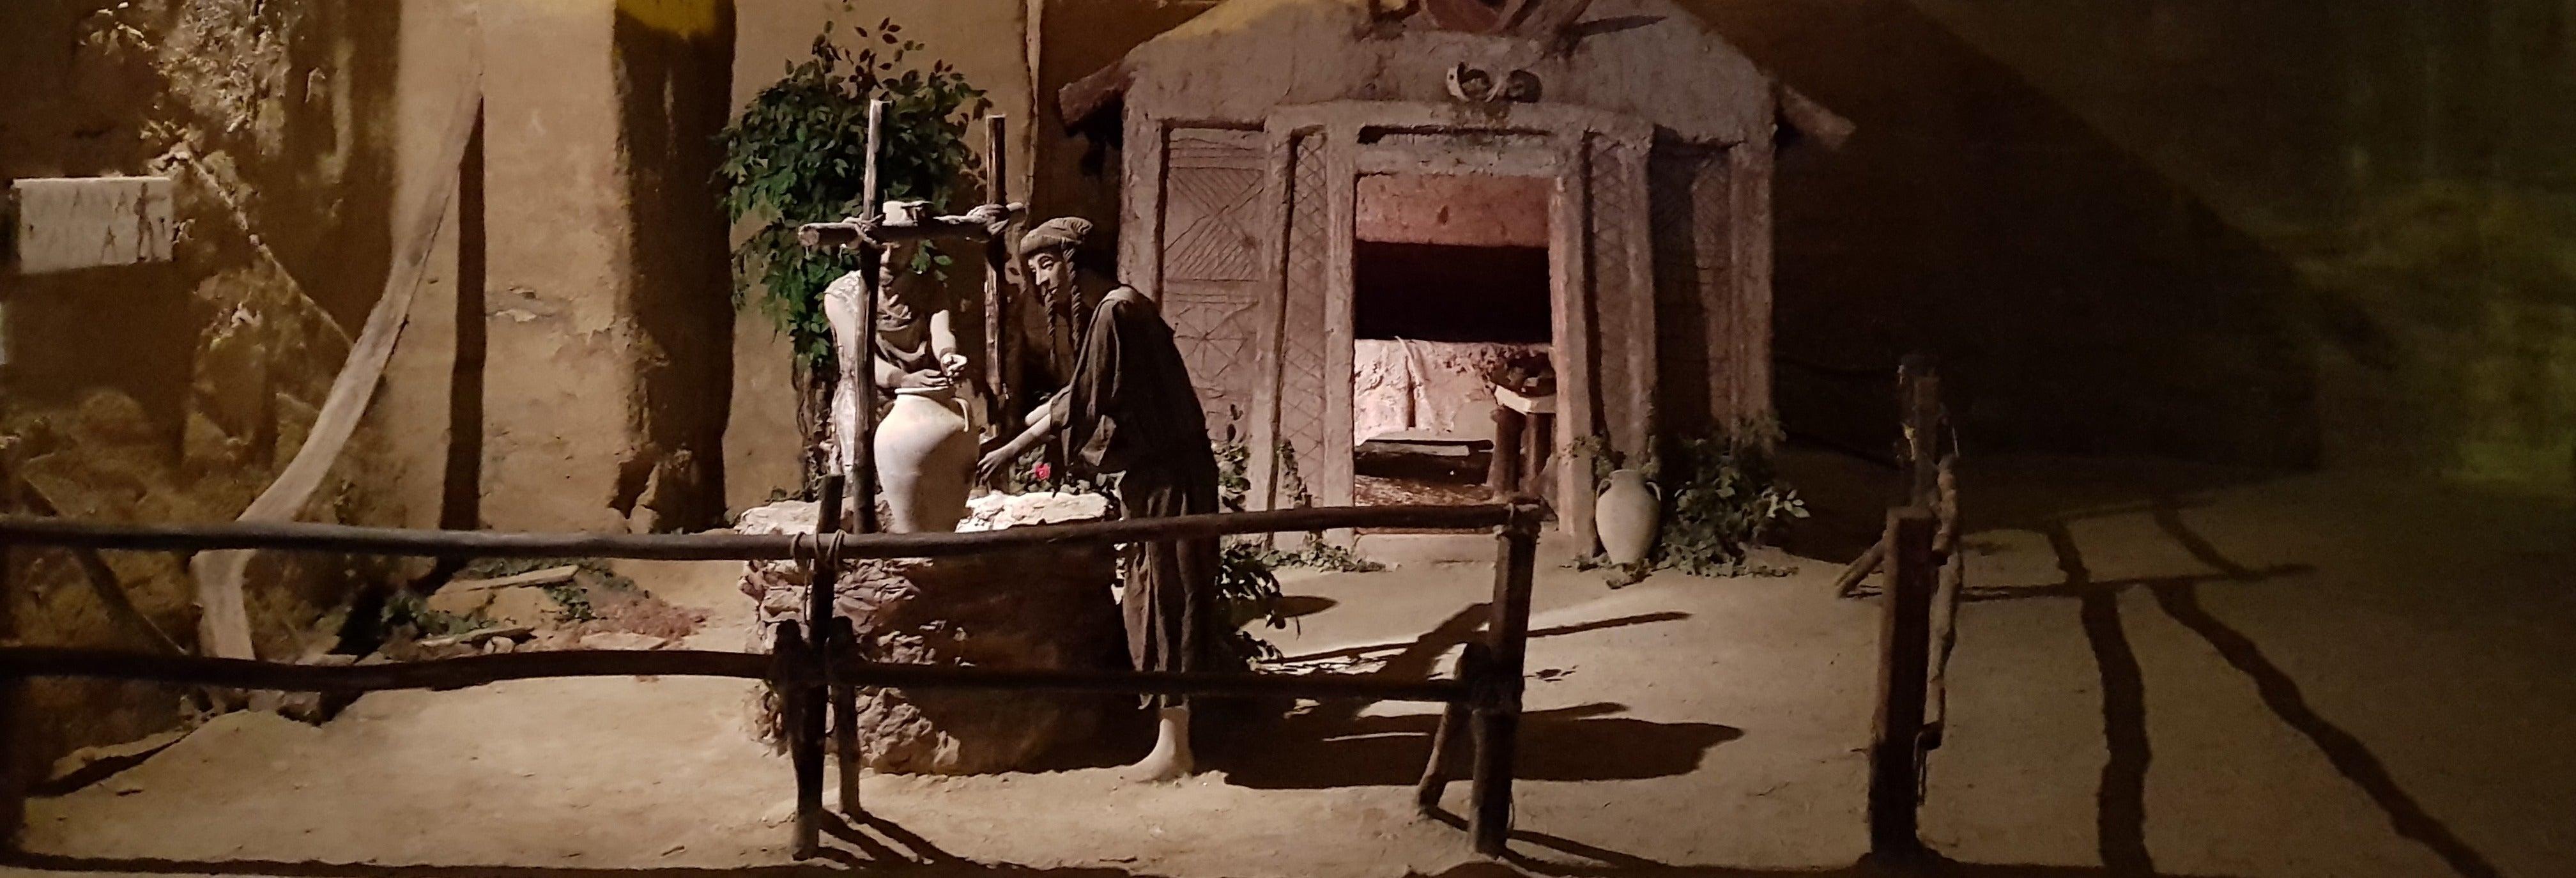 Visita guiada por Etruscopolis